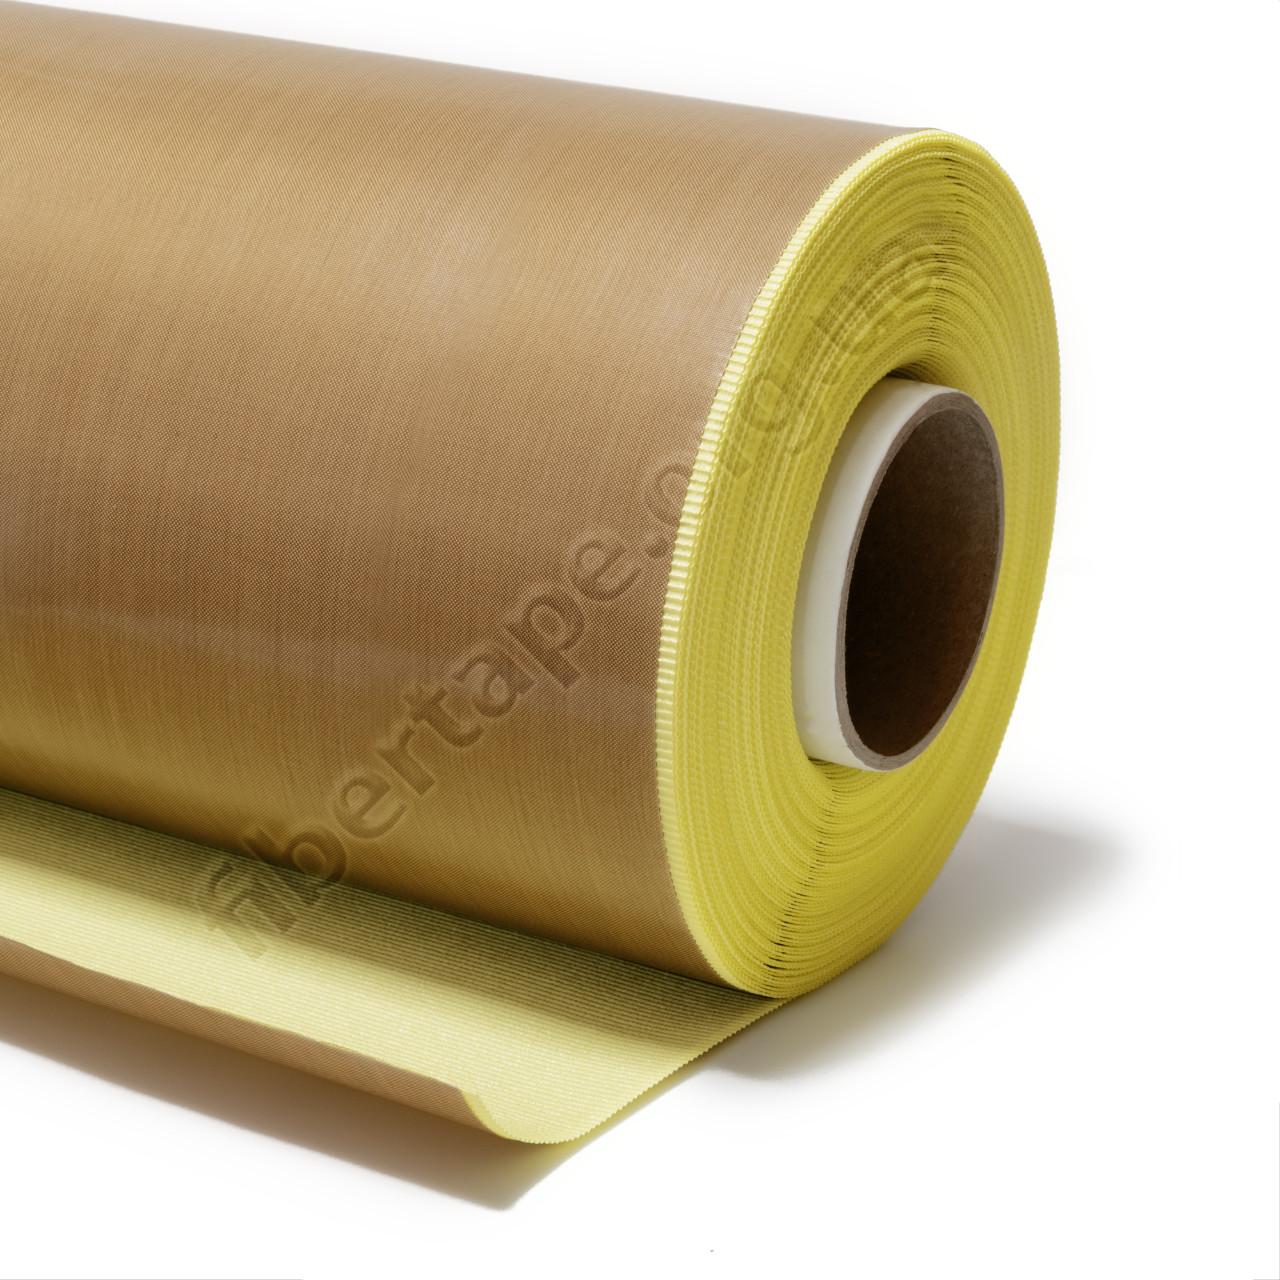 Тефлоновая лента (пленка) с клеем 75 микрон